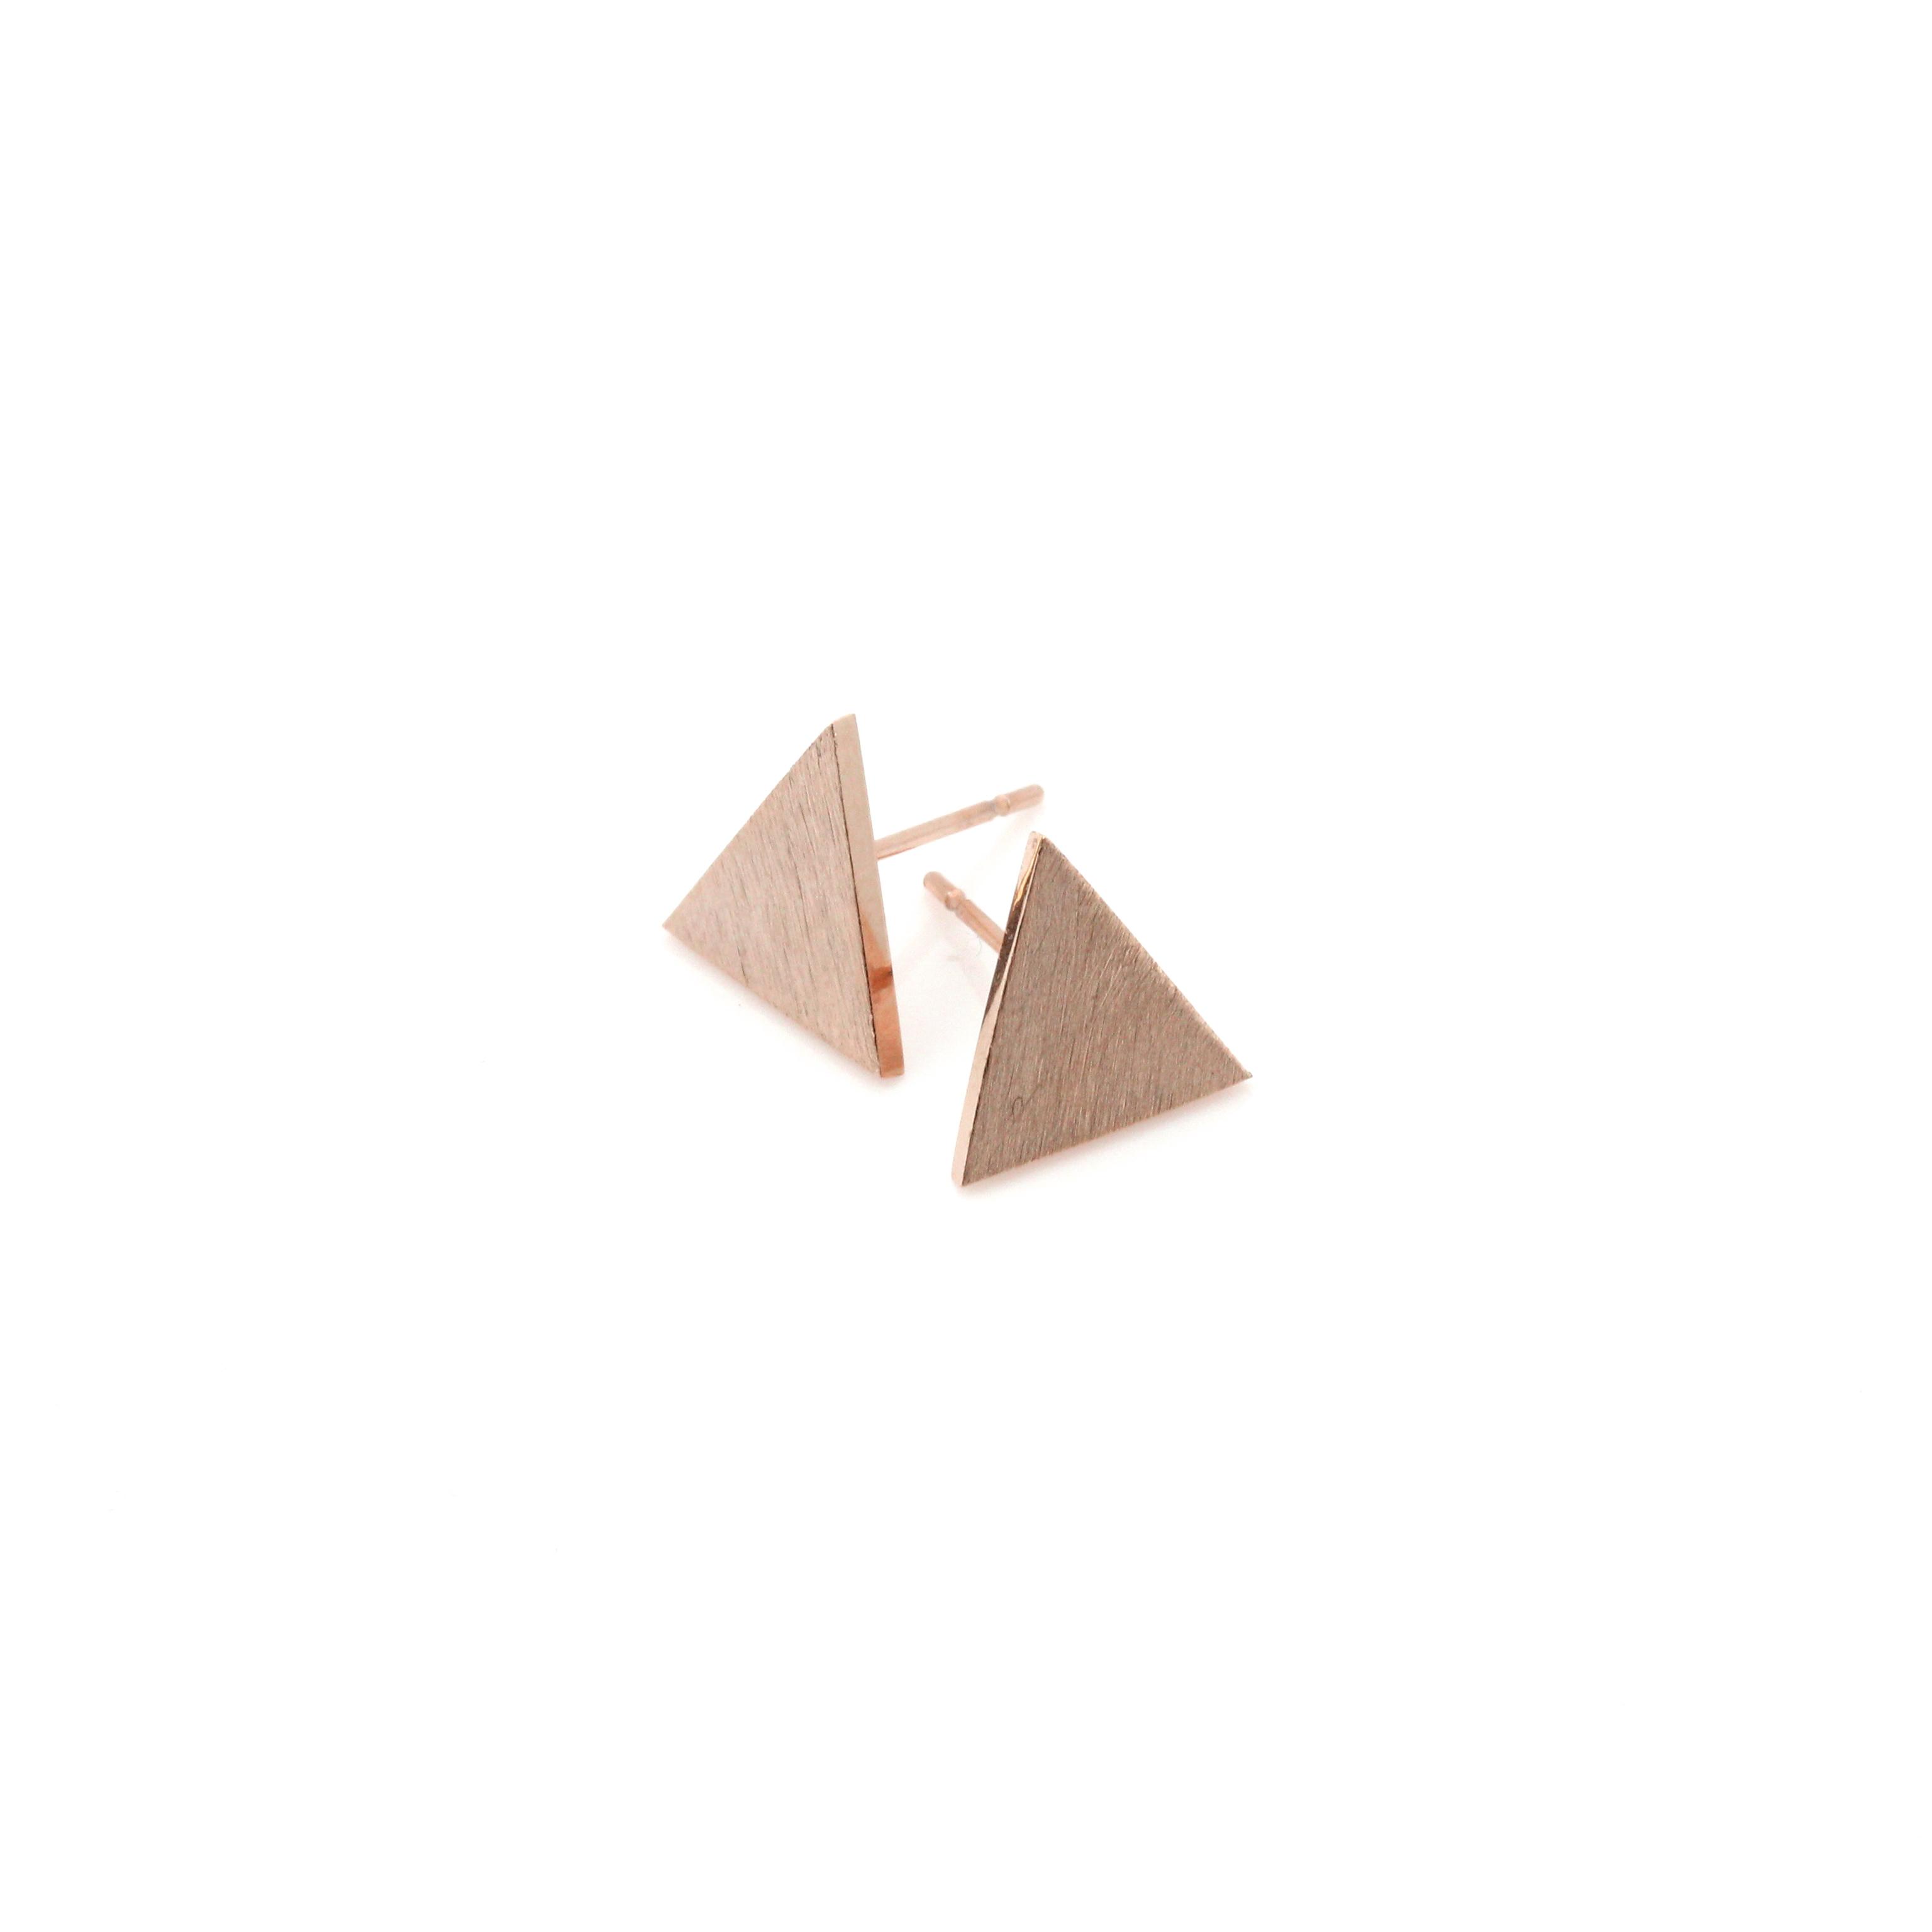 rosegold ohrstecker triangle no 2 madeleine issing. Black Bedroom Furniture Sets. Home Design Ideas